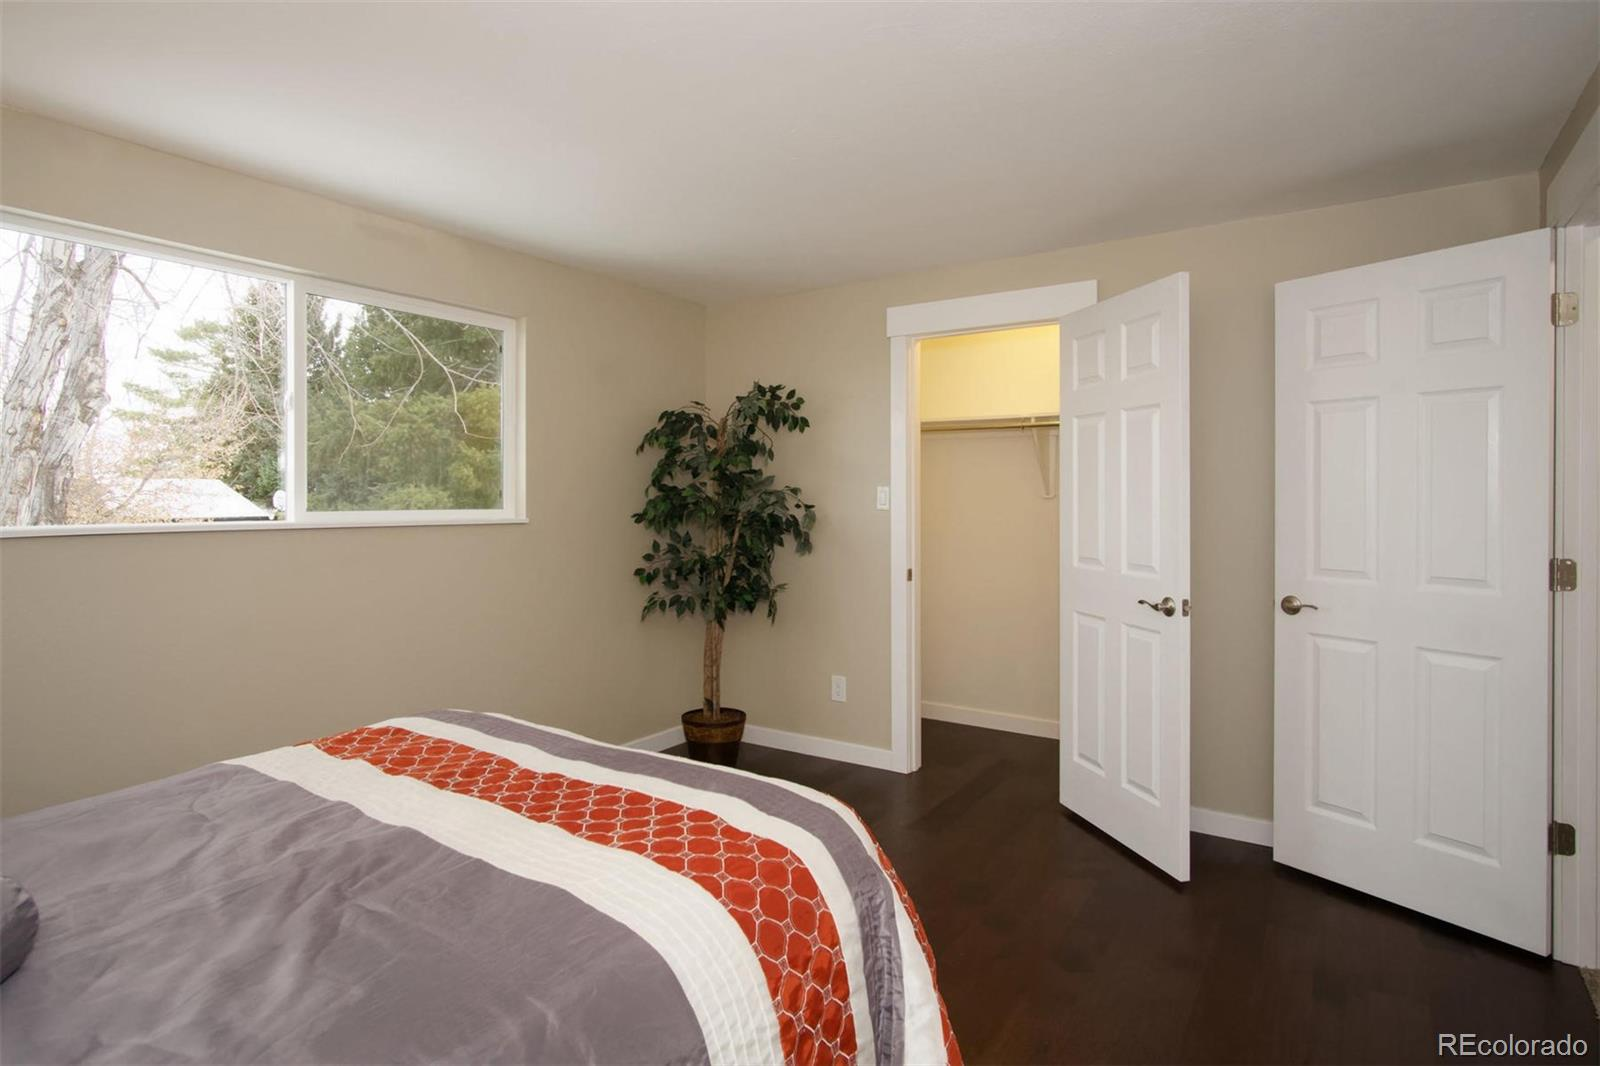 MLS# 5620602 - 13 - 13245 Deneb Drive, Littleton, CO 80124